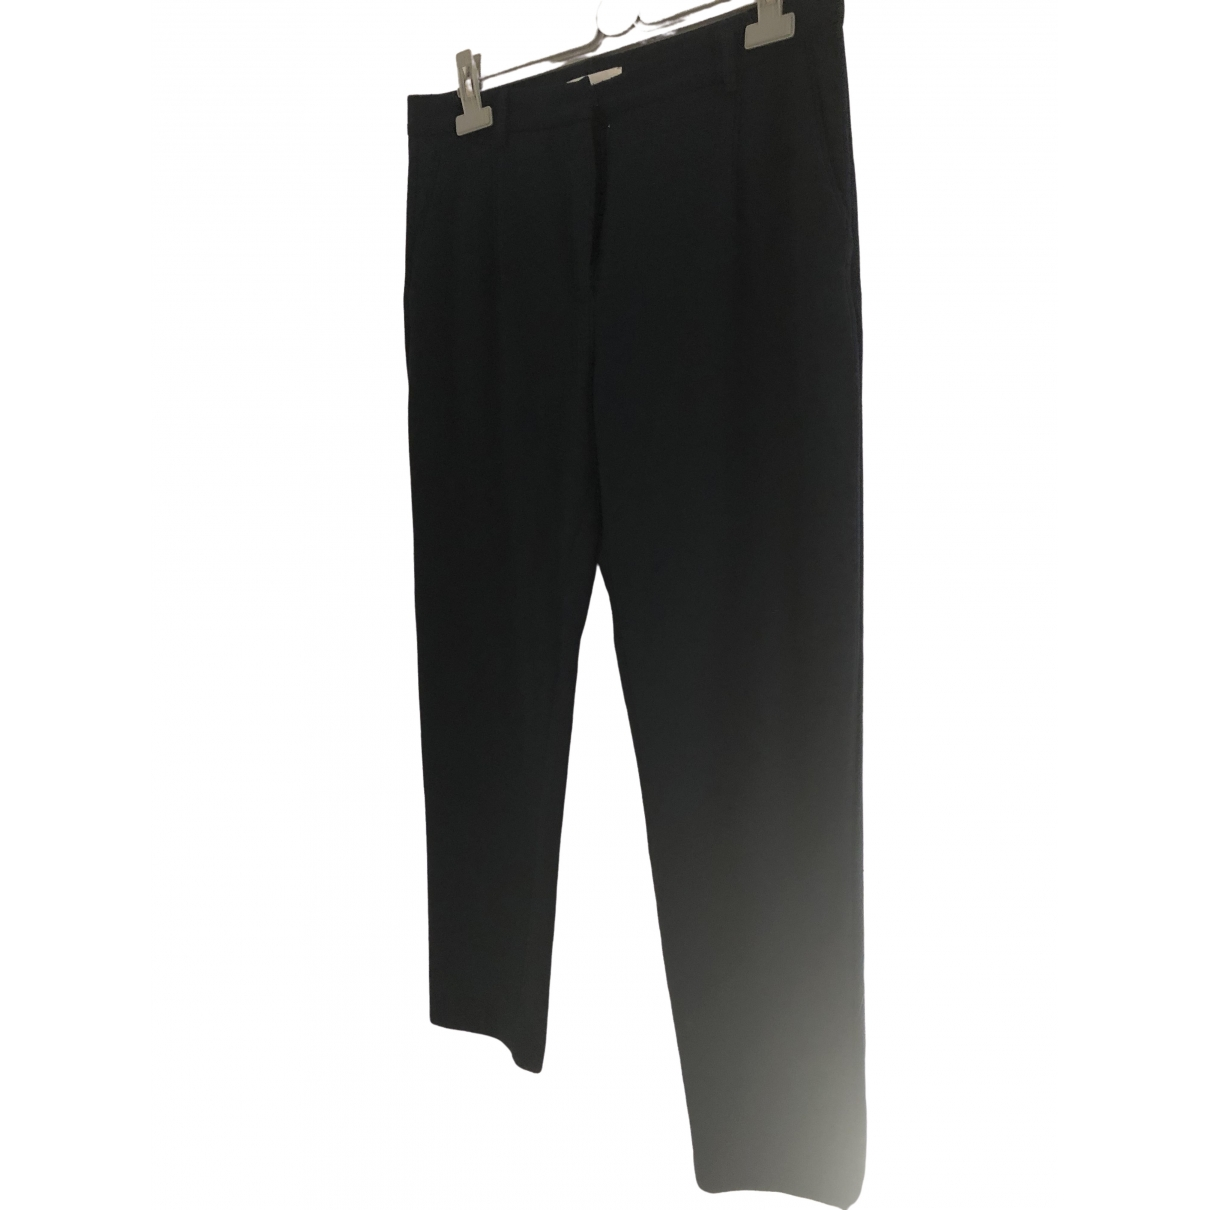 Samsoe & Samsoe \N Navy Trousers for Women L International